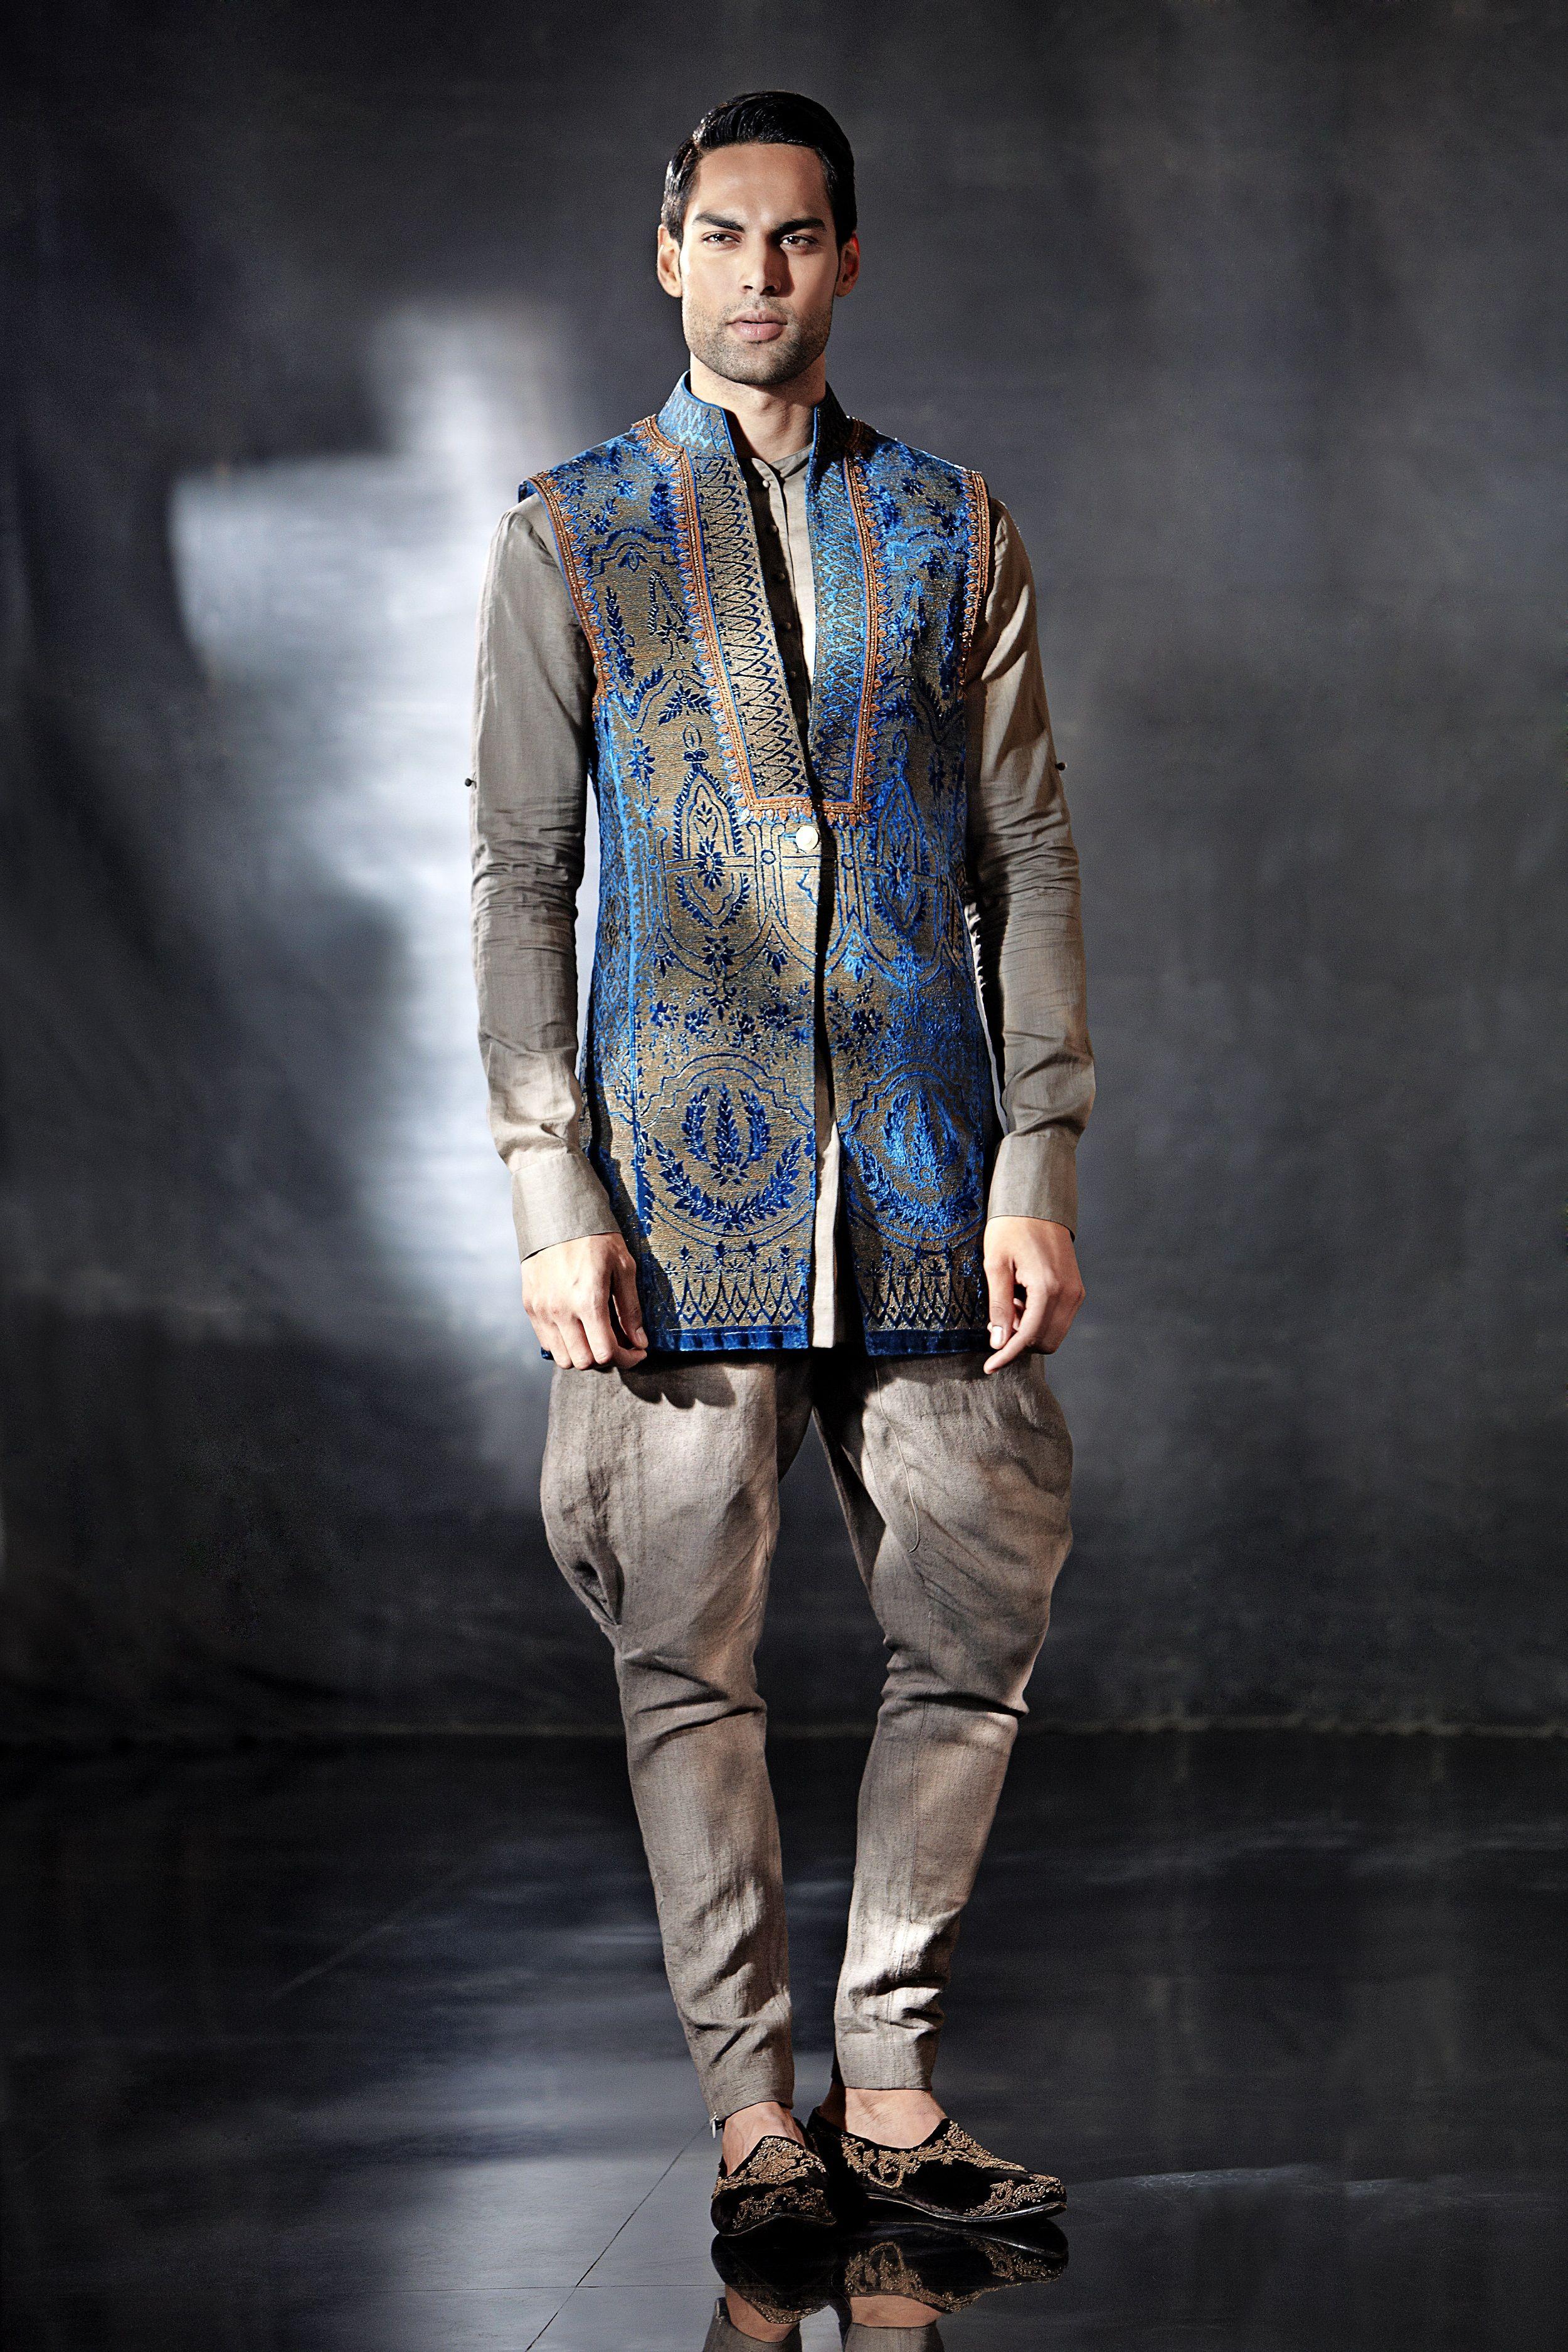 c8f212ab7c68b Indian Fashion   Tarun Tahiliani   Modern Mughal's Collection   Indian  Wedding   Indian Wedding   Men's Wear